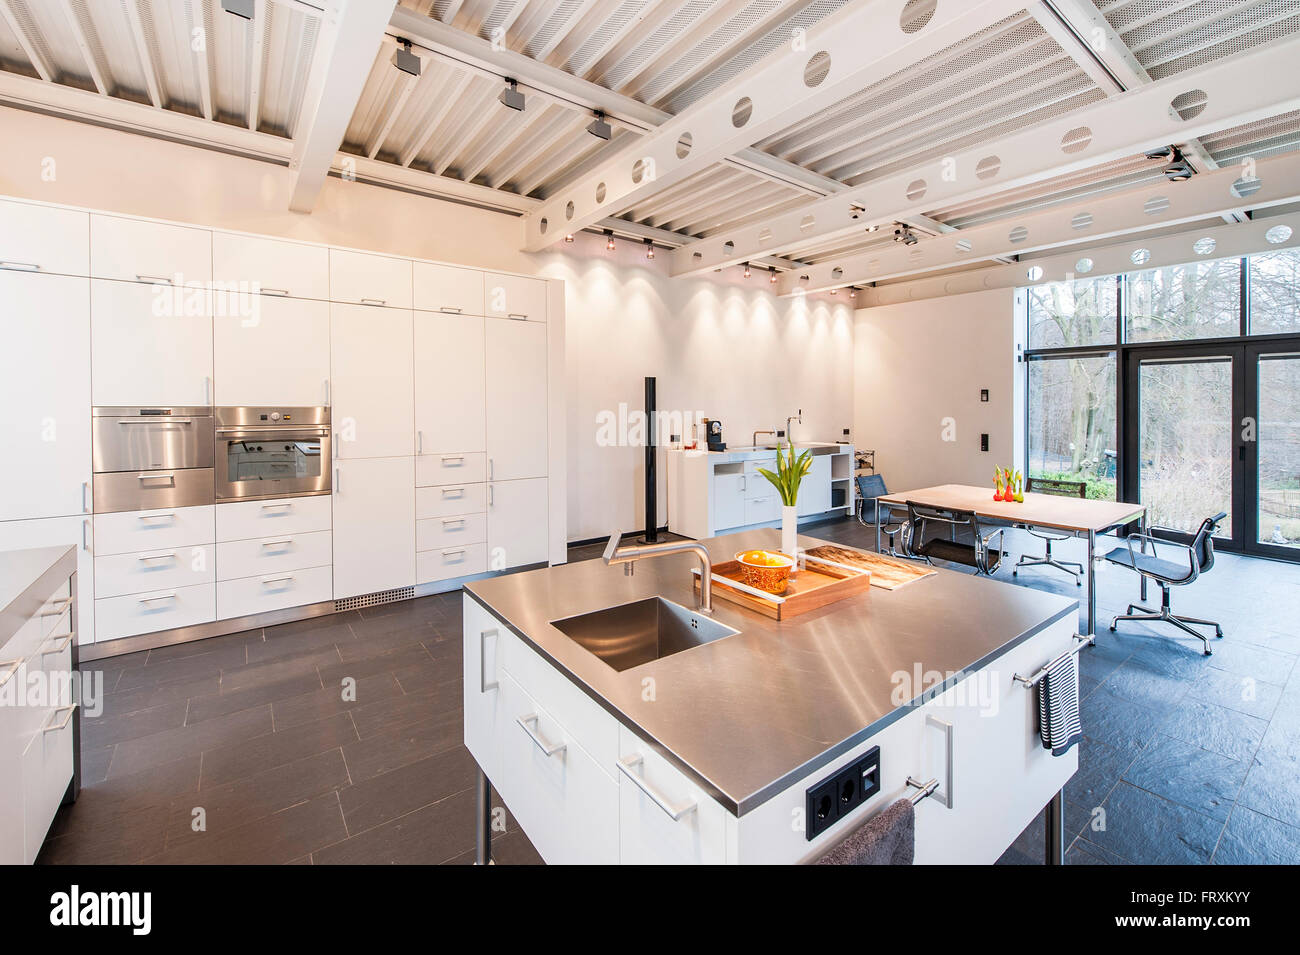 Cucina a pianta aperta all'interno di una villa di Bauhaus, Sauerland, Germania Immagini Stock